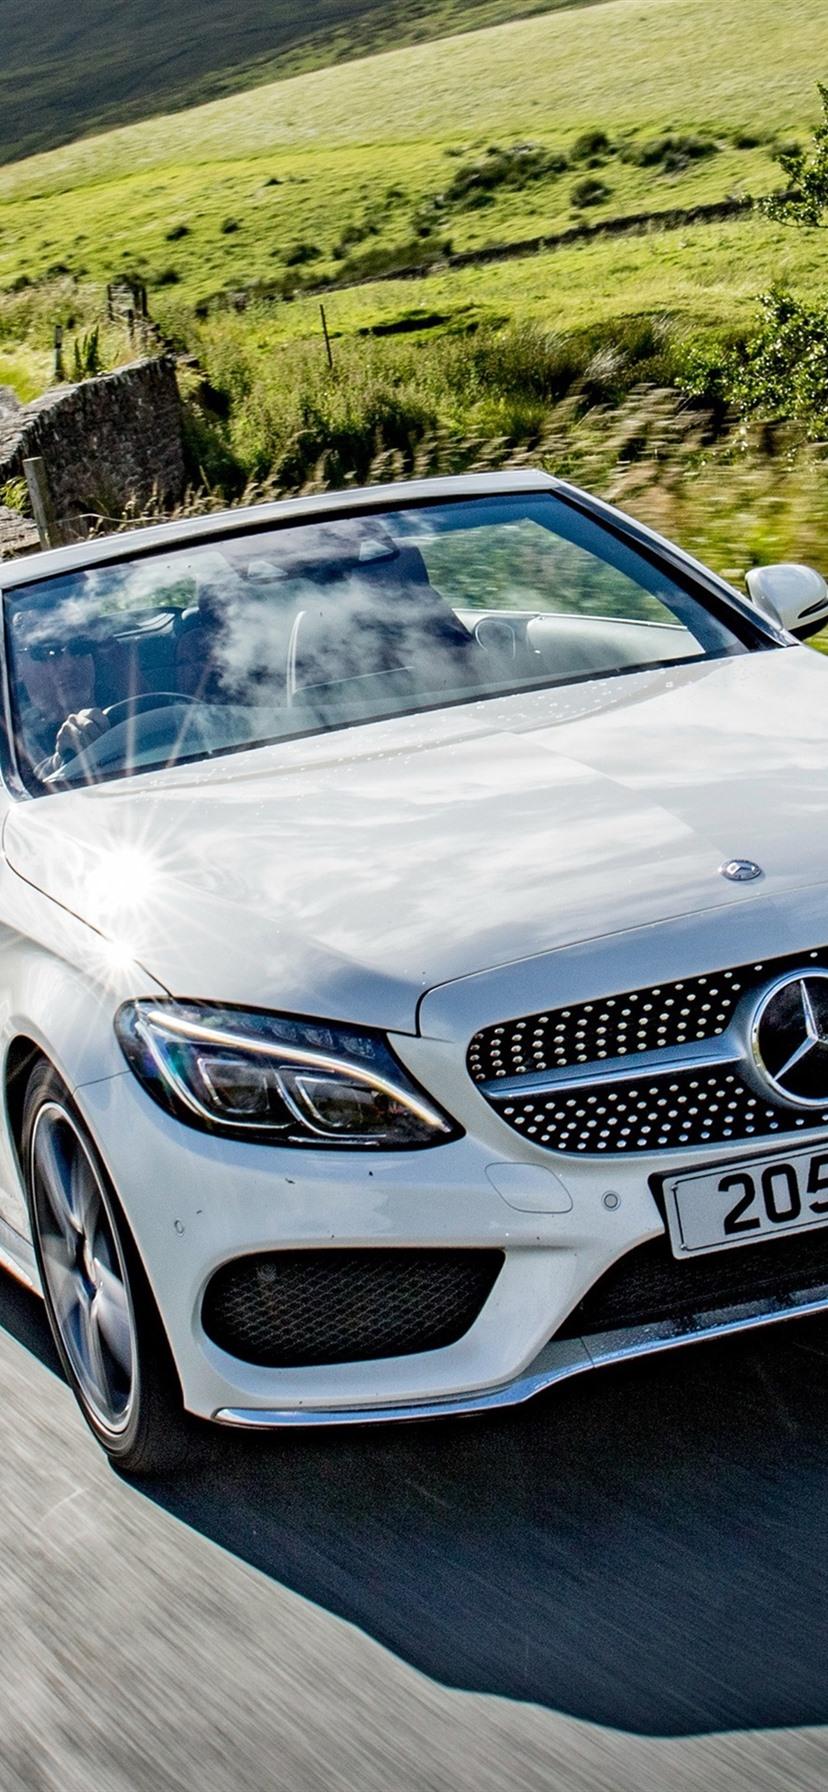 Mercedes Benz AMG C Class Cabriolet A21 white car 21x21 ...